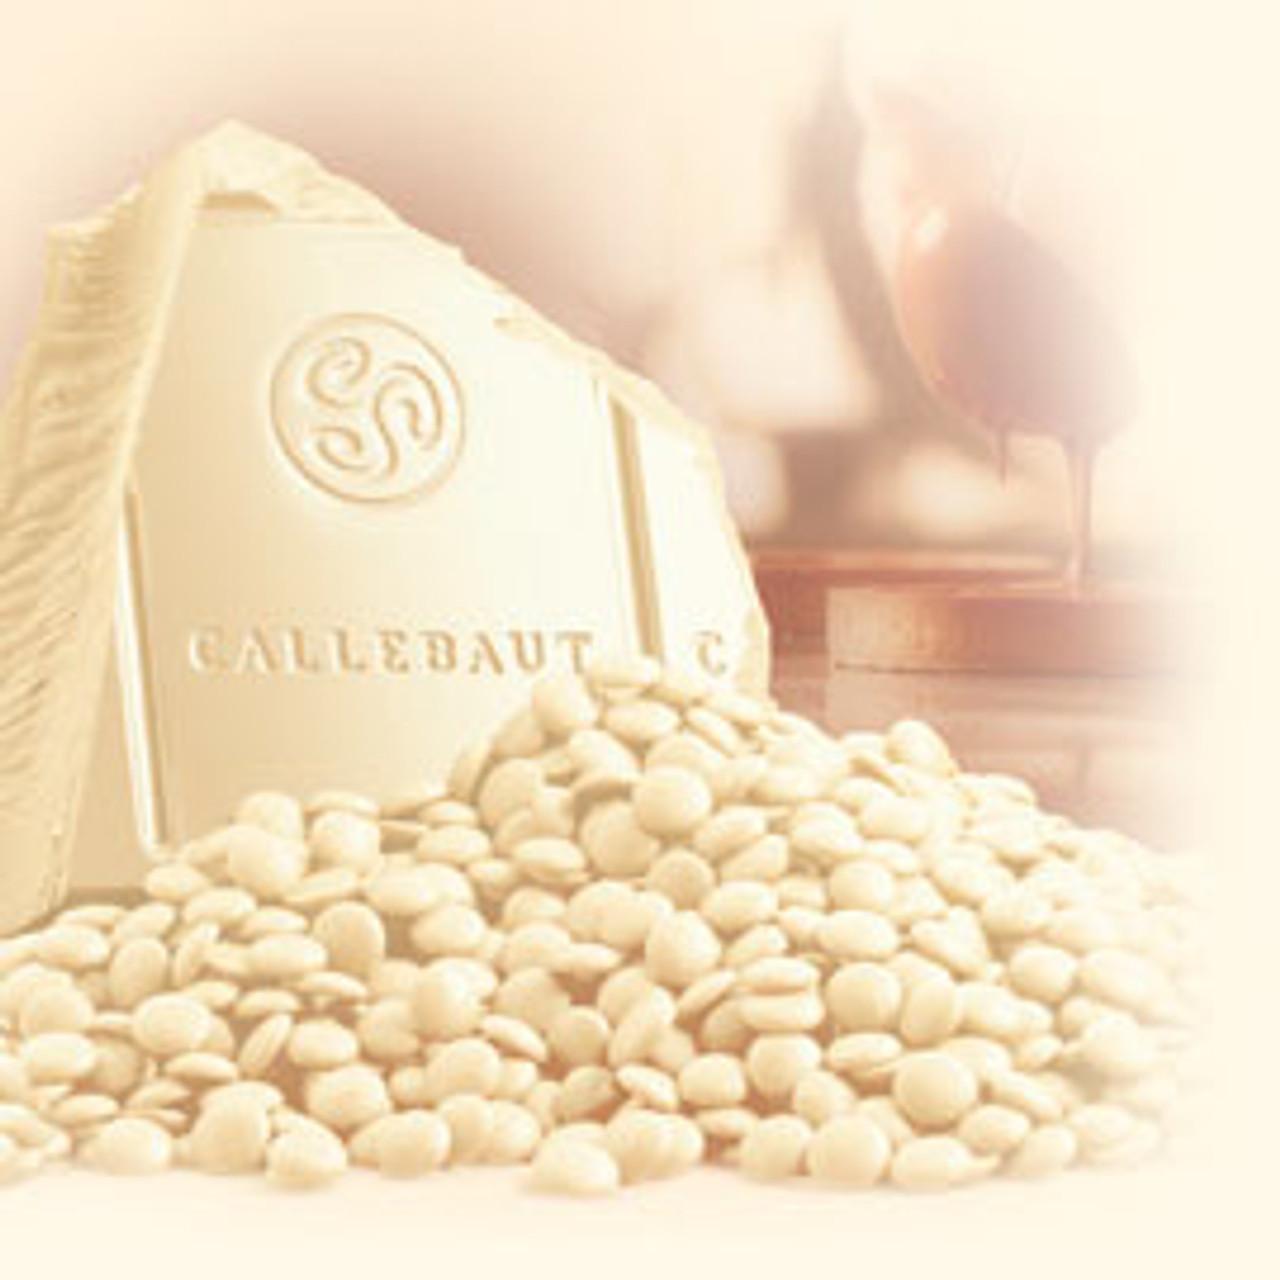 Chocolate Callets Callebaut white 2.5kg